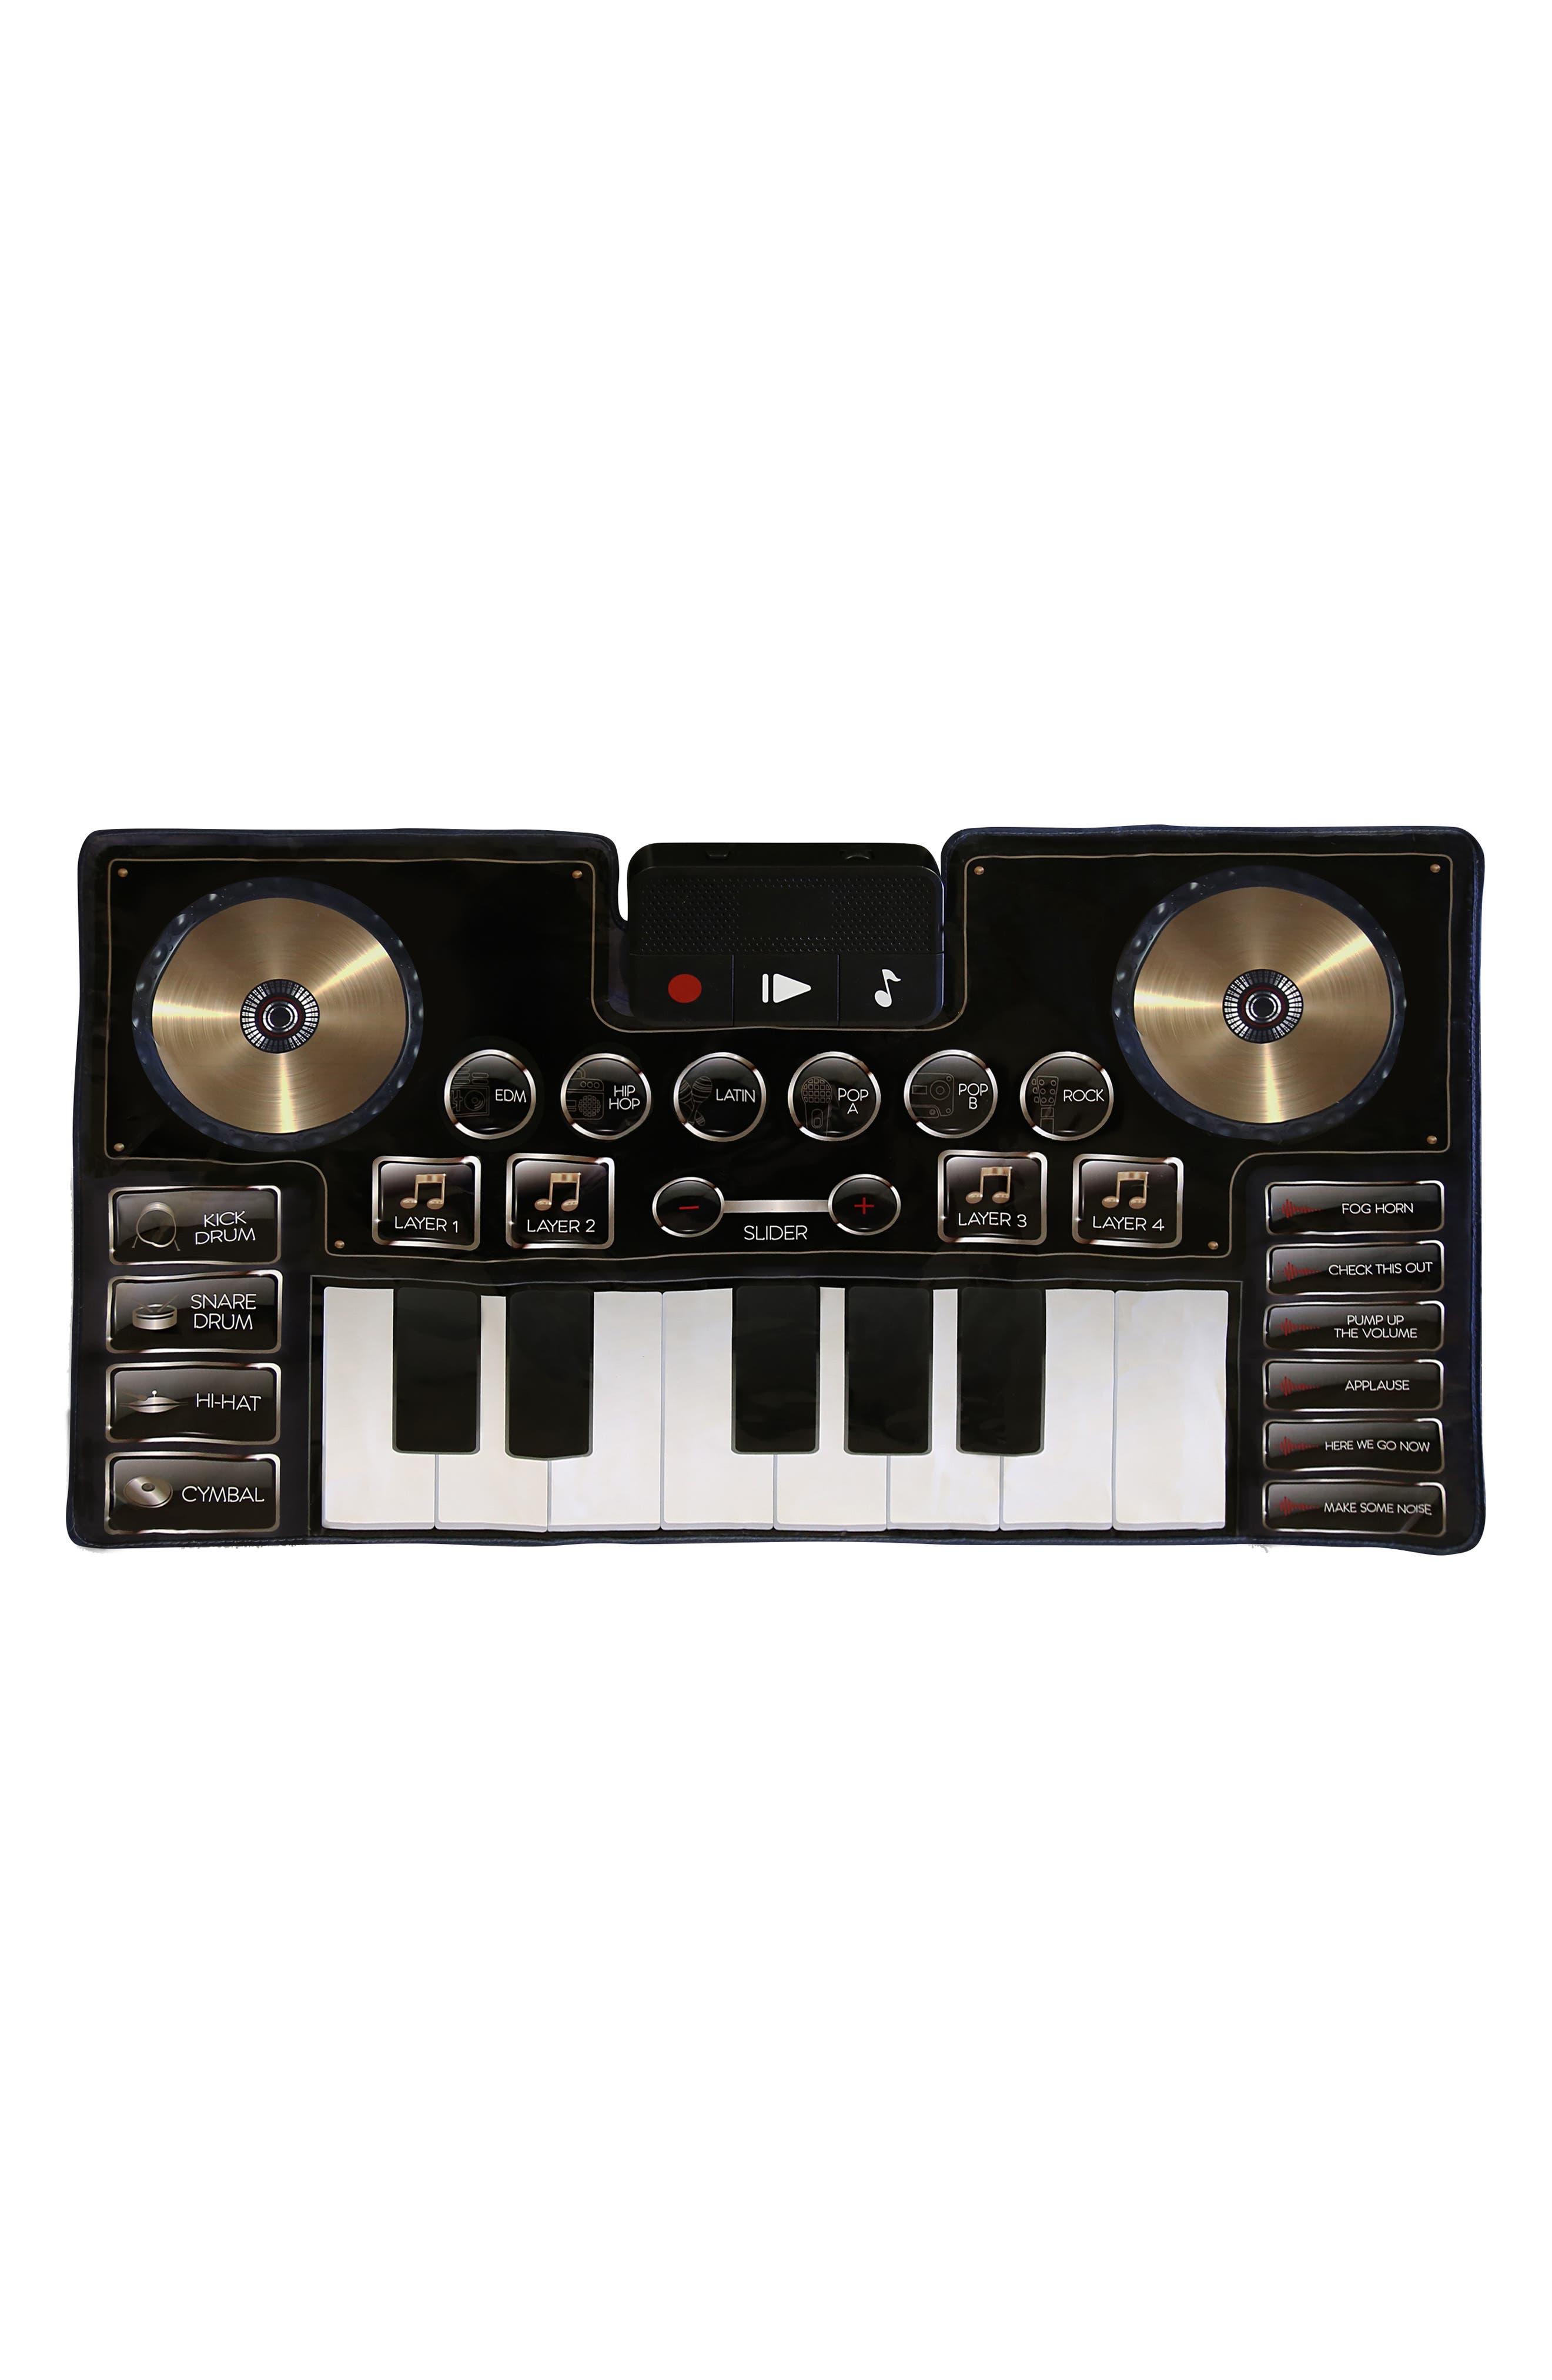 Fao Schwarz Dj Mixer Music Mat